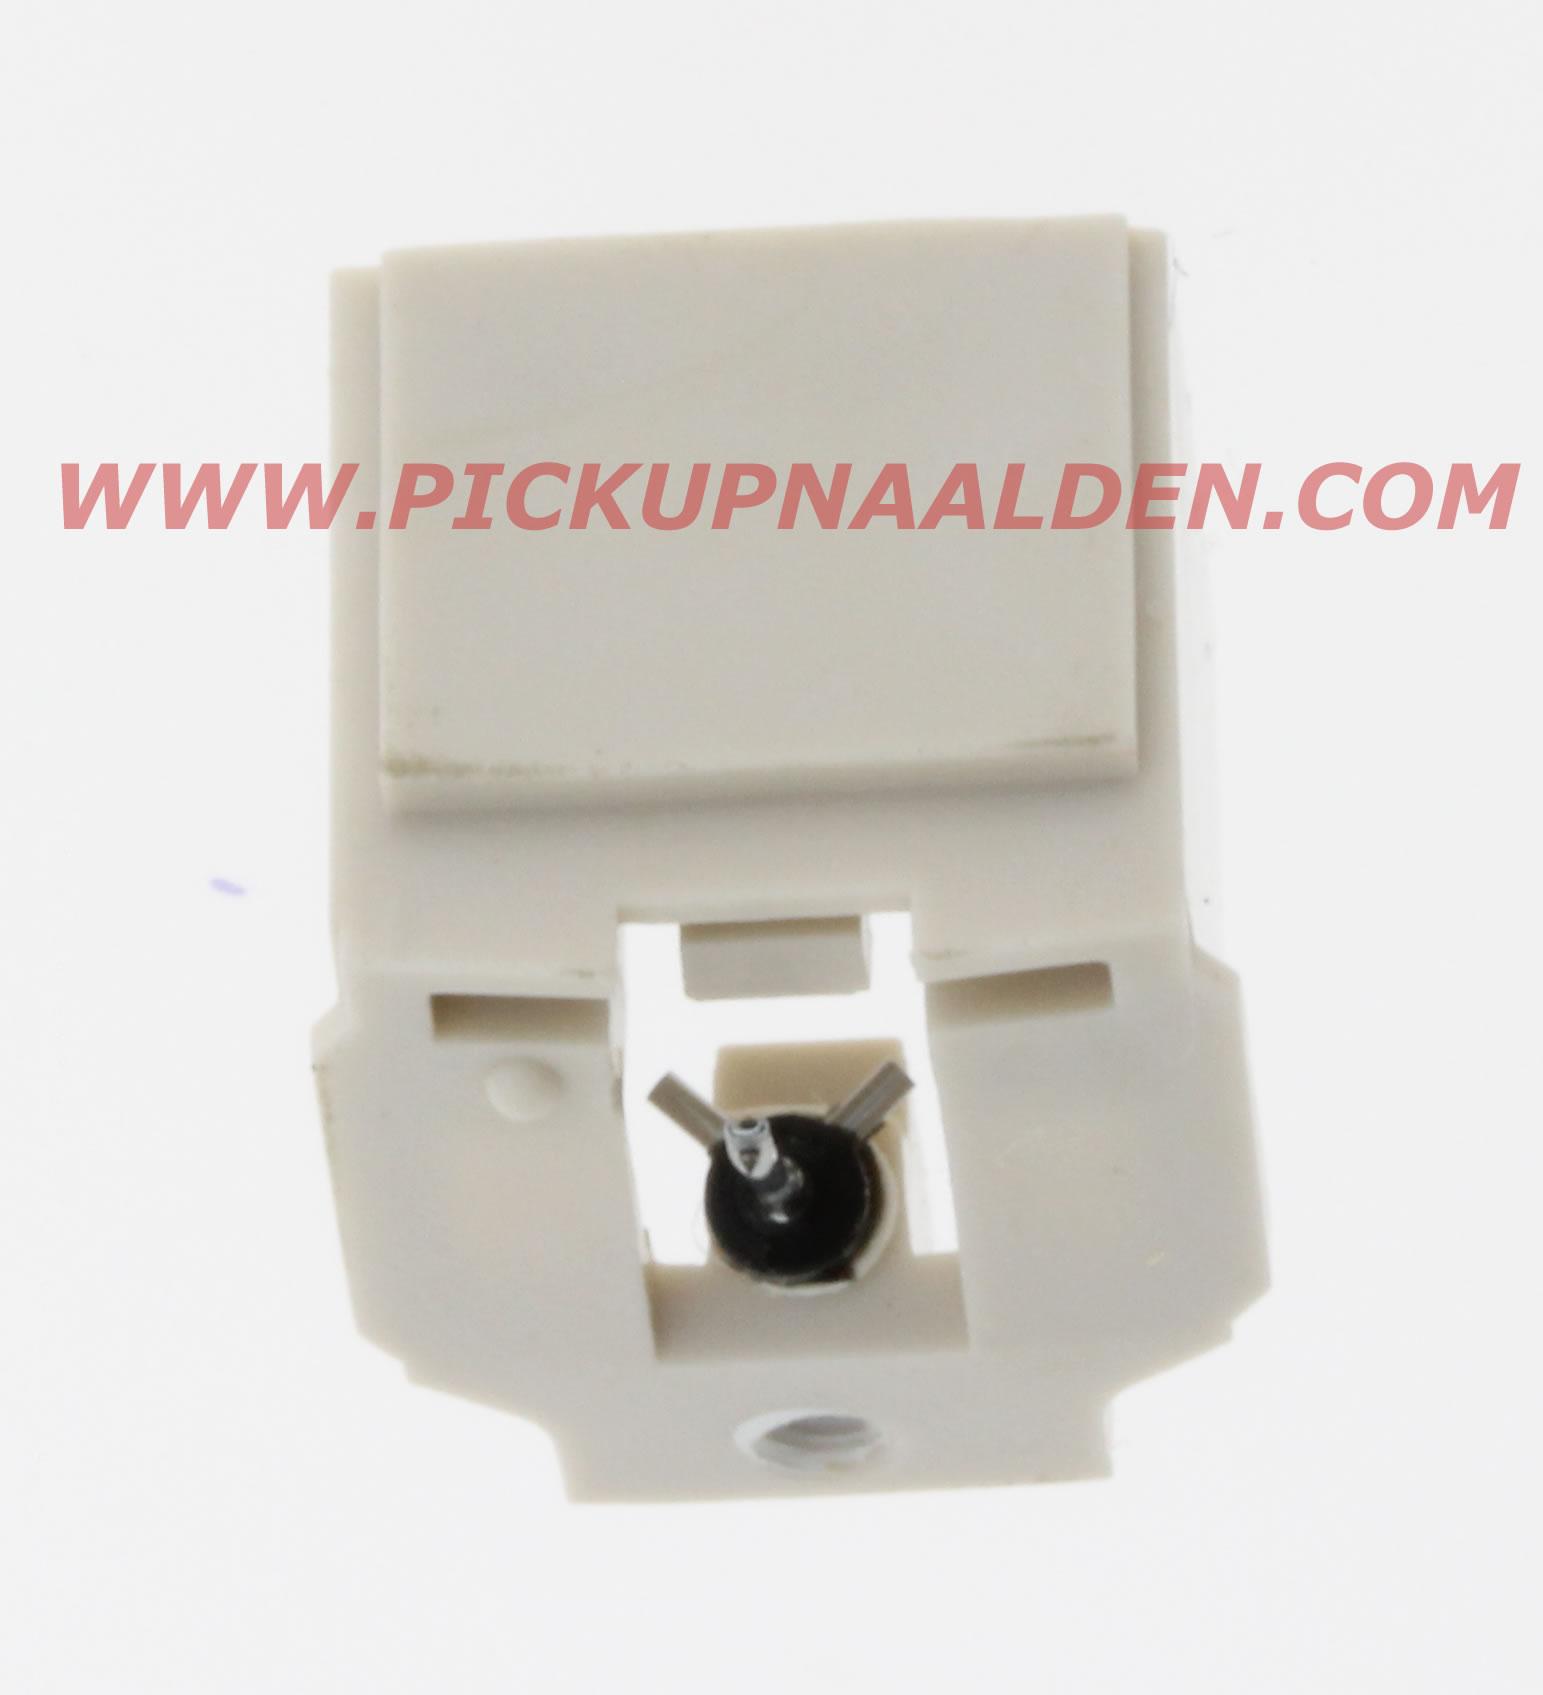 ATN-3601, ATN-3600C ATN-3600L Turntable Stylus Needle Audio Technica ATN-3600